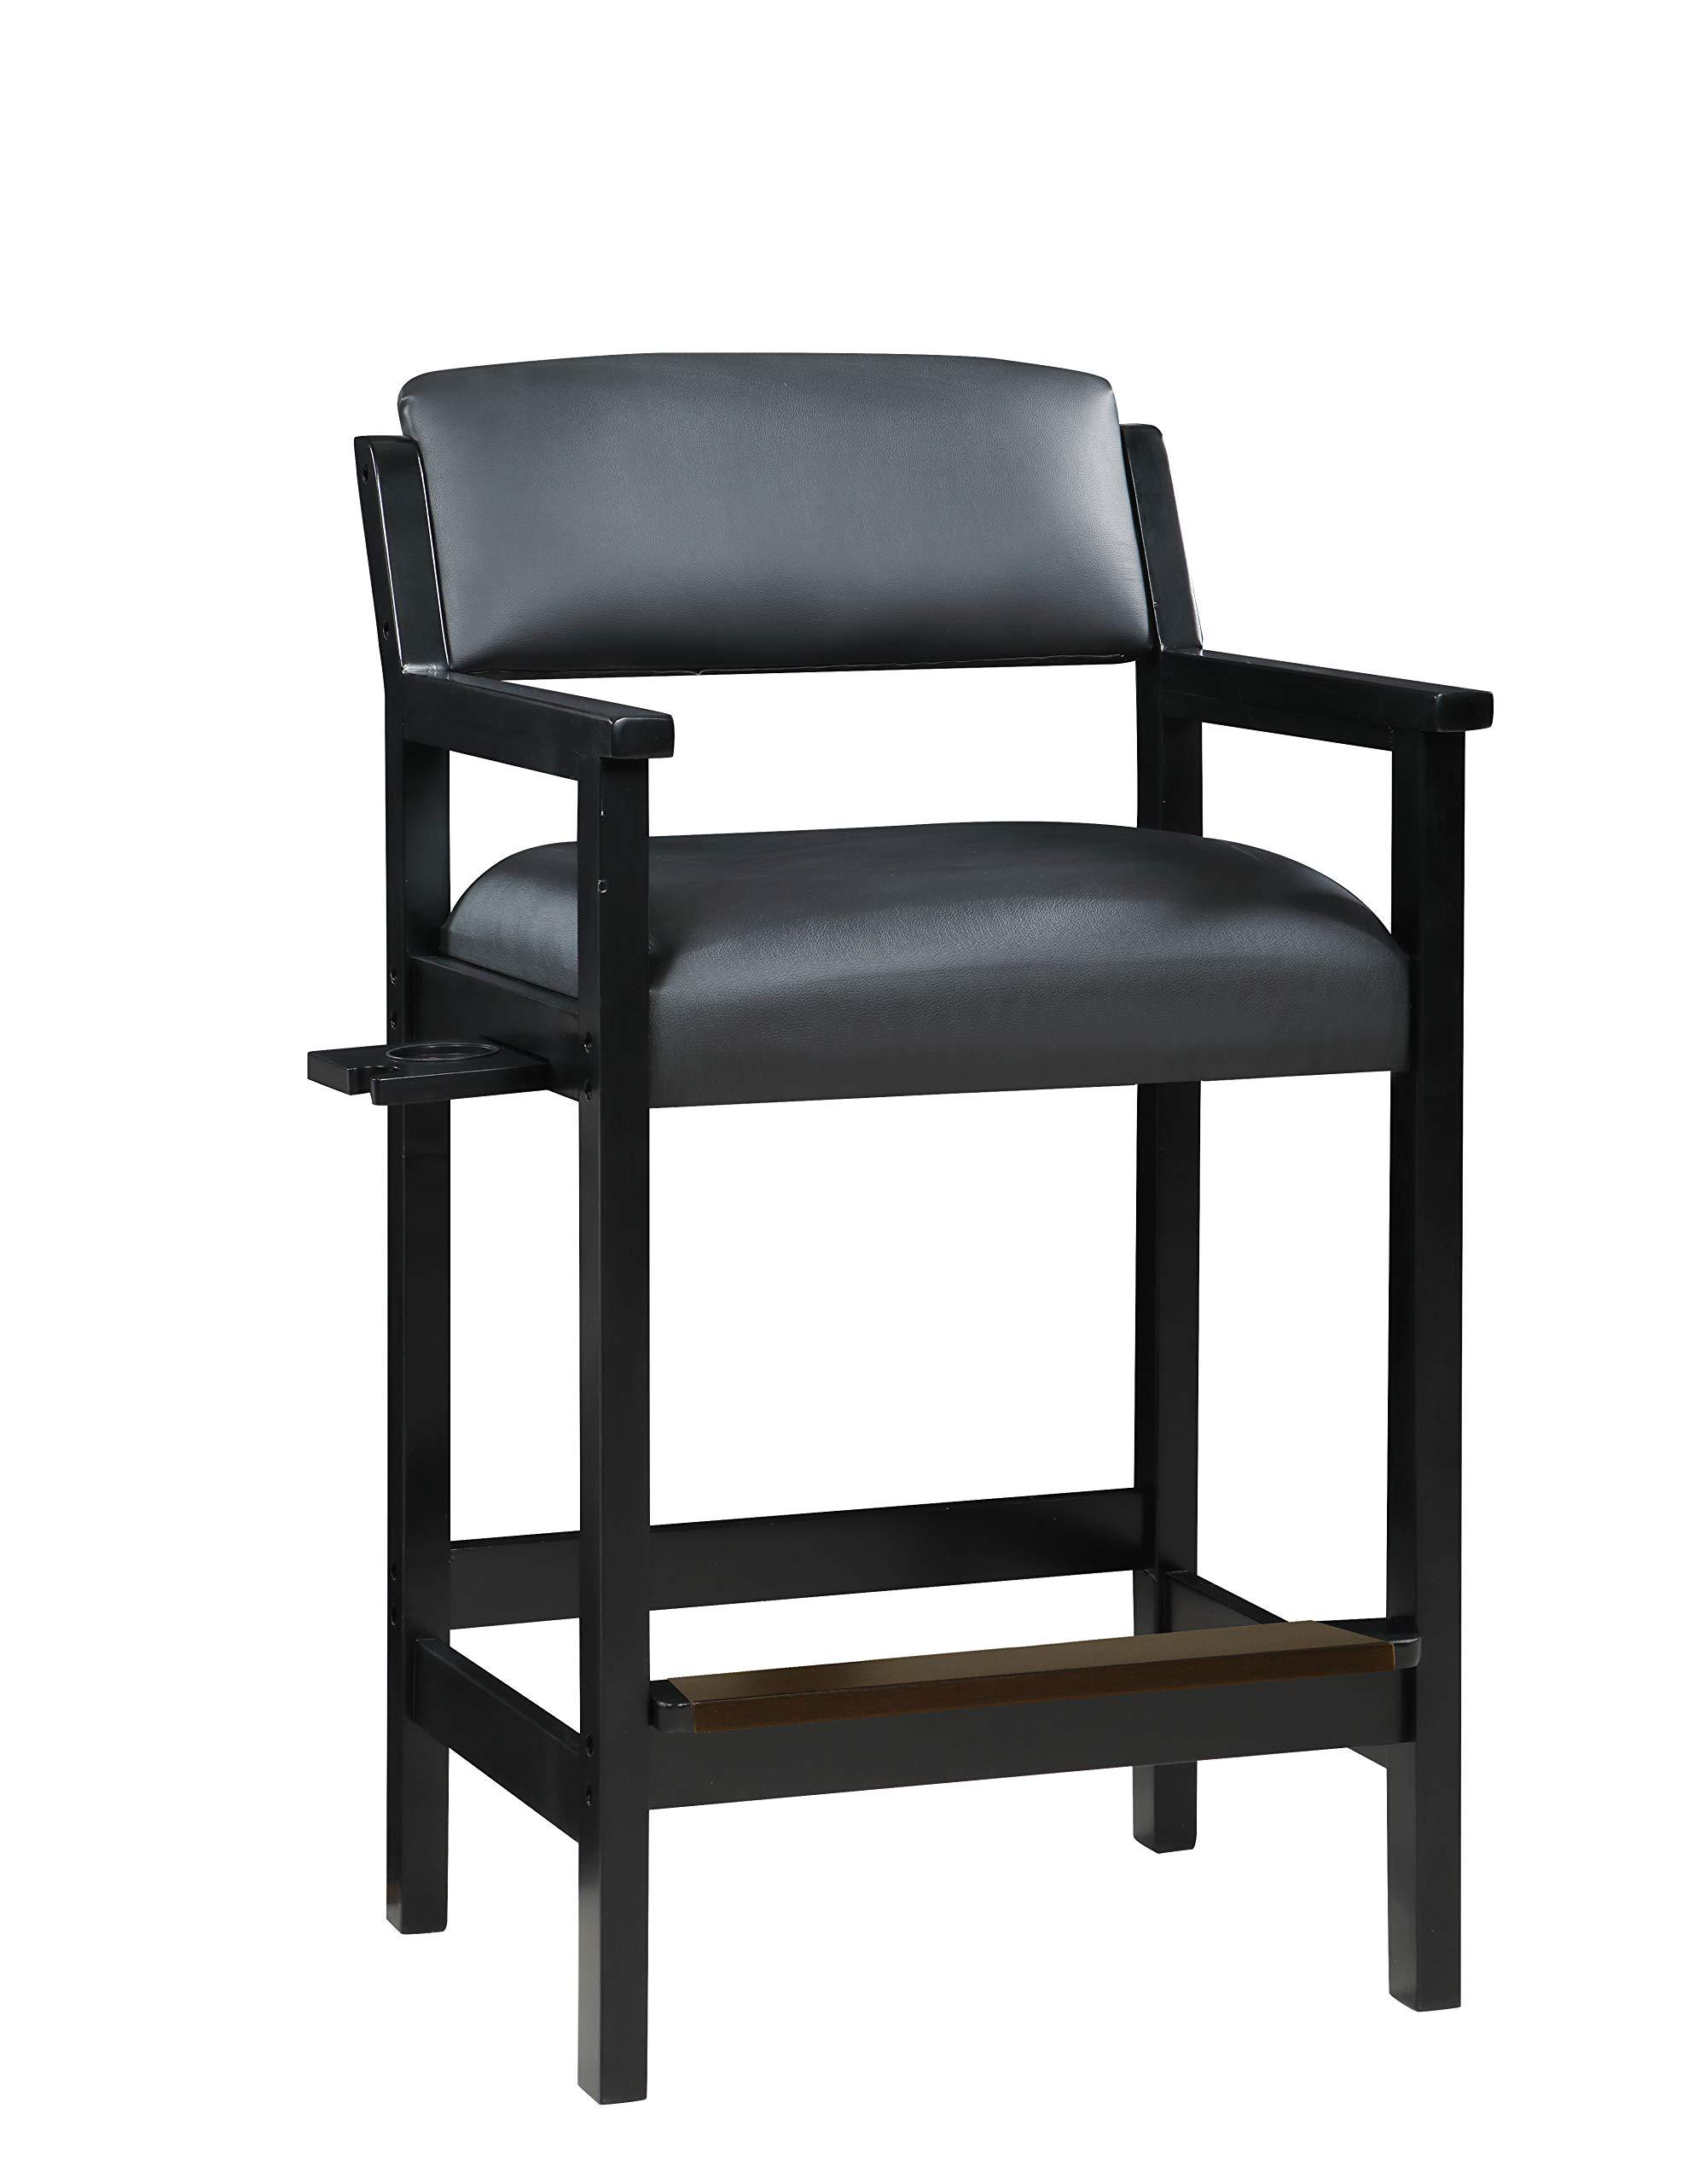 Hathaway Cambridge Spectator Chair, 22'' L x 26.8'' W x 44.5'' H, Black